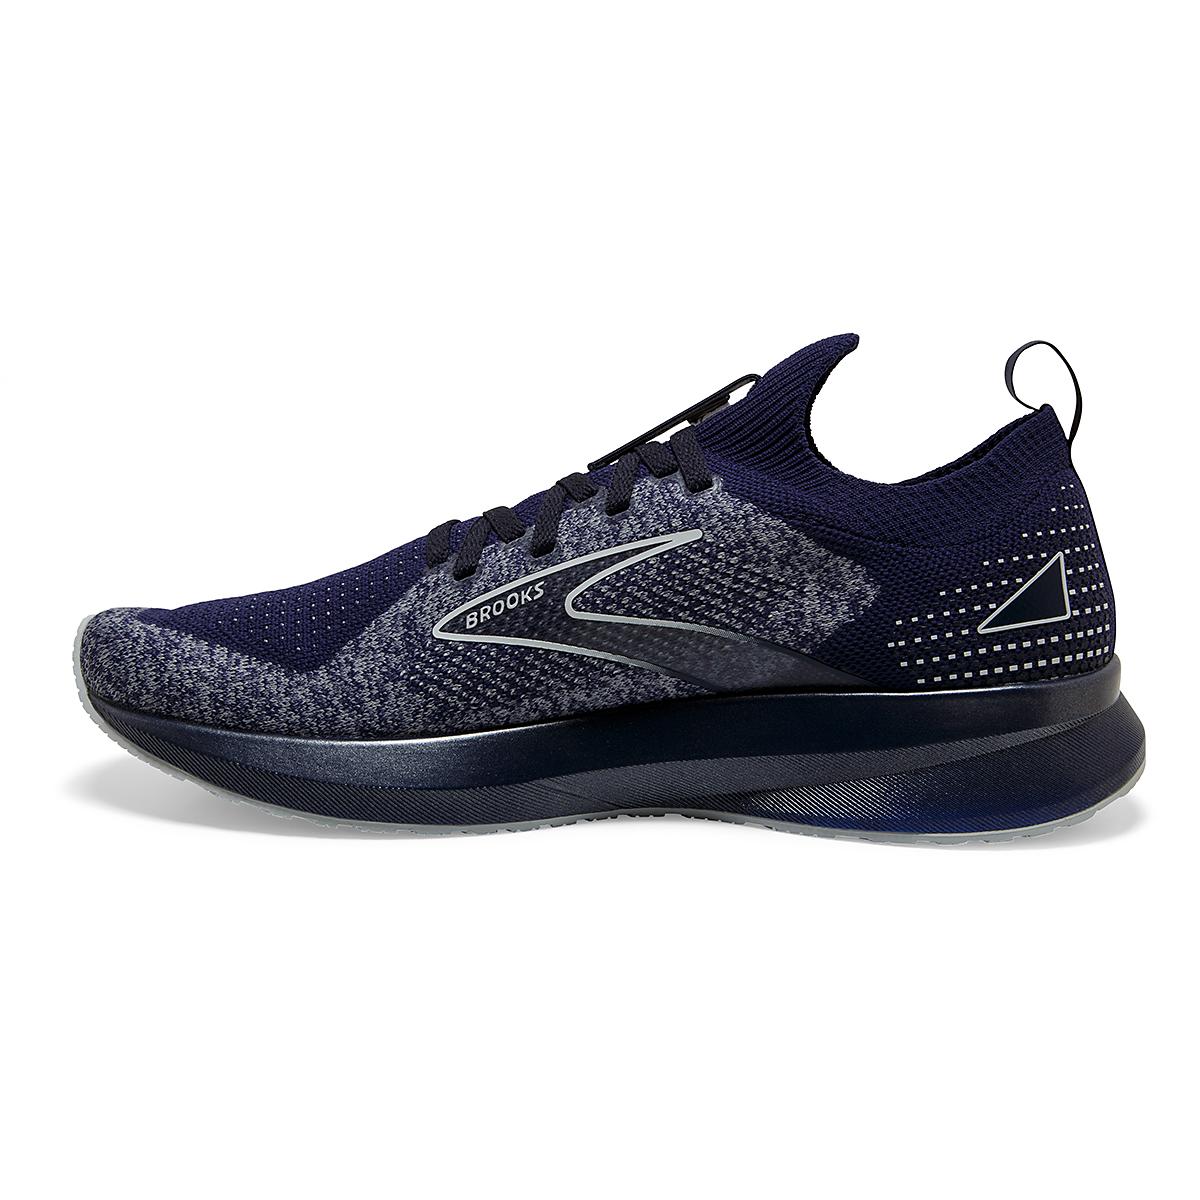 Men's Brooks Levitate Stealthfit 5 Running Shoe - Color: Peacoat/Grey - Size: 7 - Width: Regular, Peacoat/Grey, large, image 4